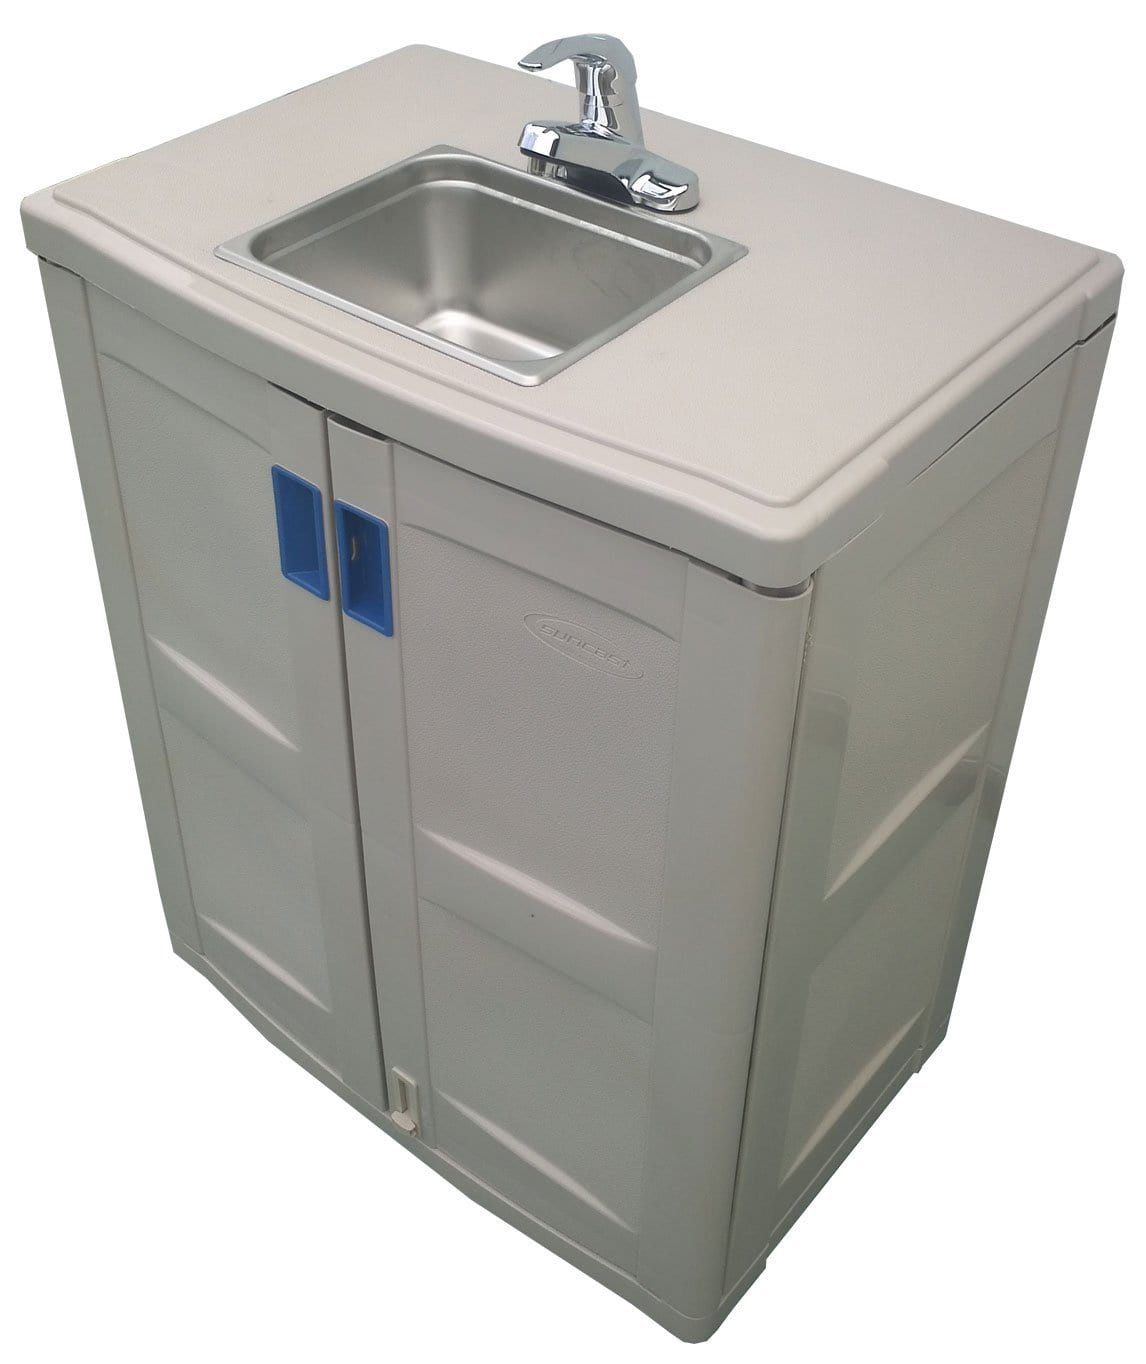 Plastic Portable Sink : ... Portable self contained) -Single / Double KAZEMA PORTABLE TOILETS